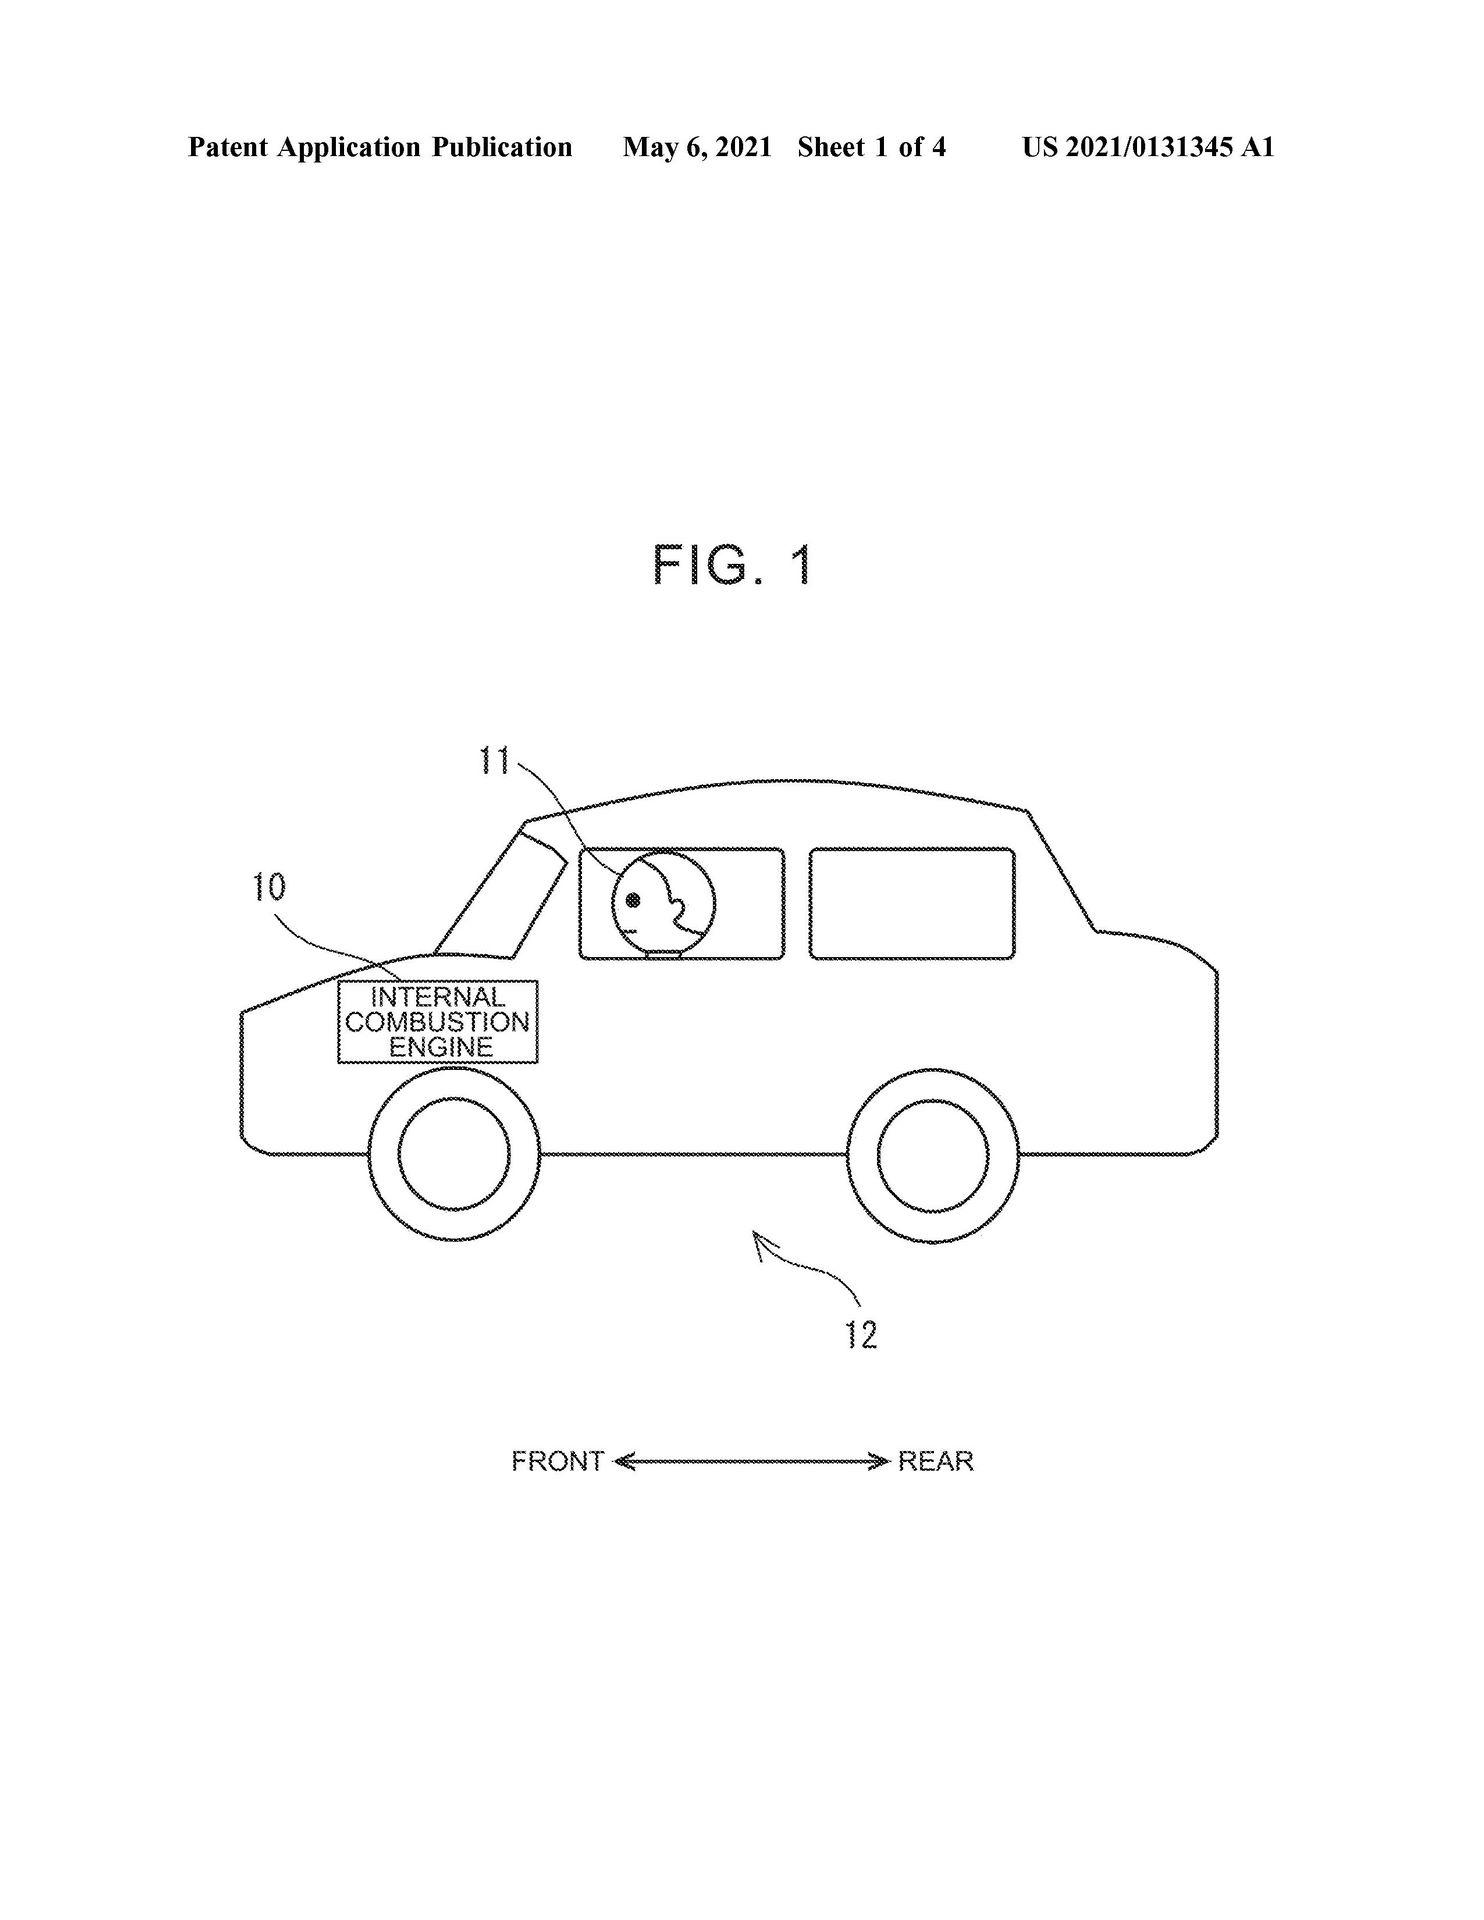 Toyota-Twin-Turbo-V8-Patent-0002